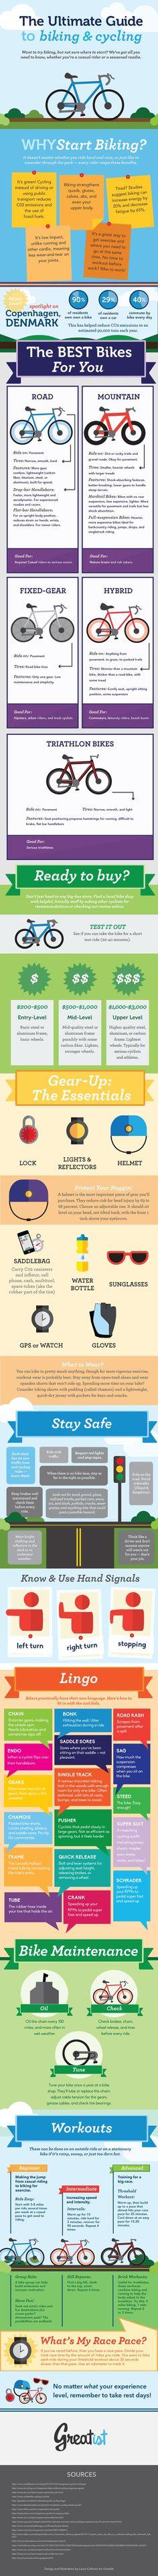 The Ultimate Guide to Biking and Cycling #biking #cycling #workout